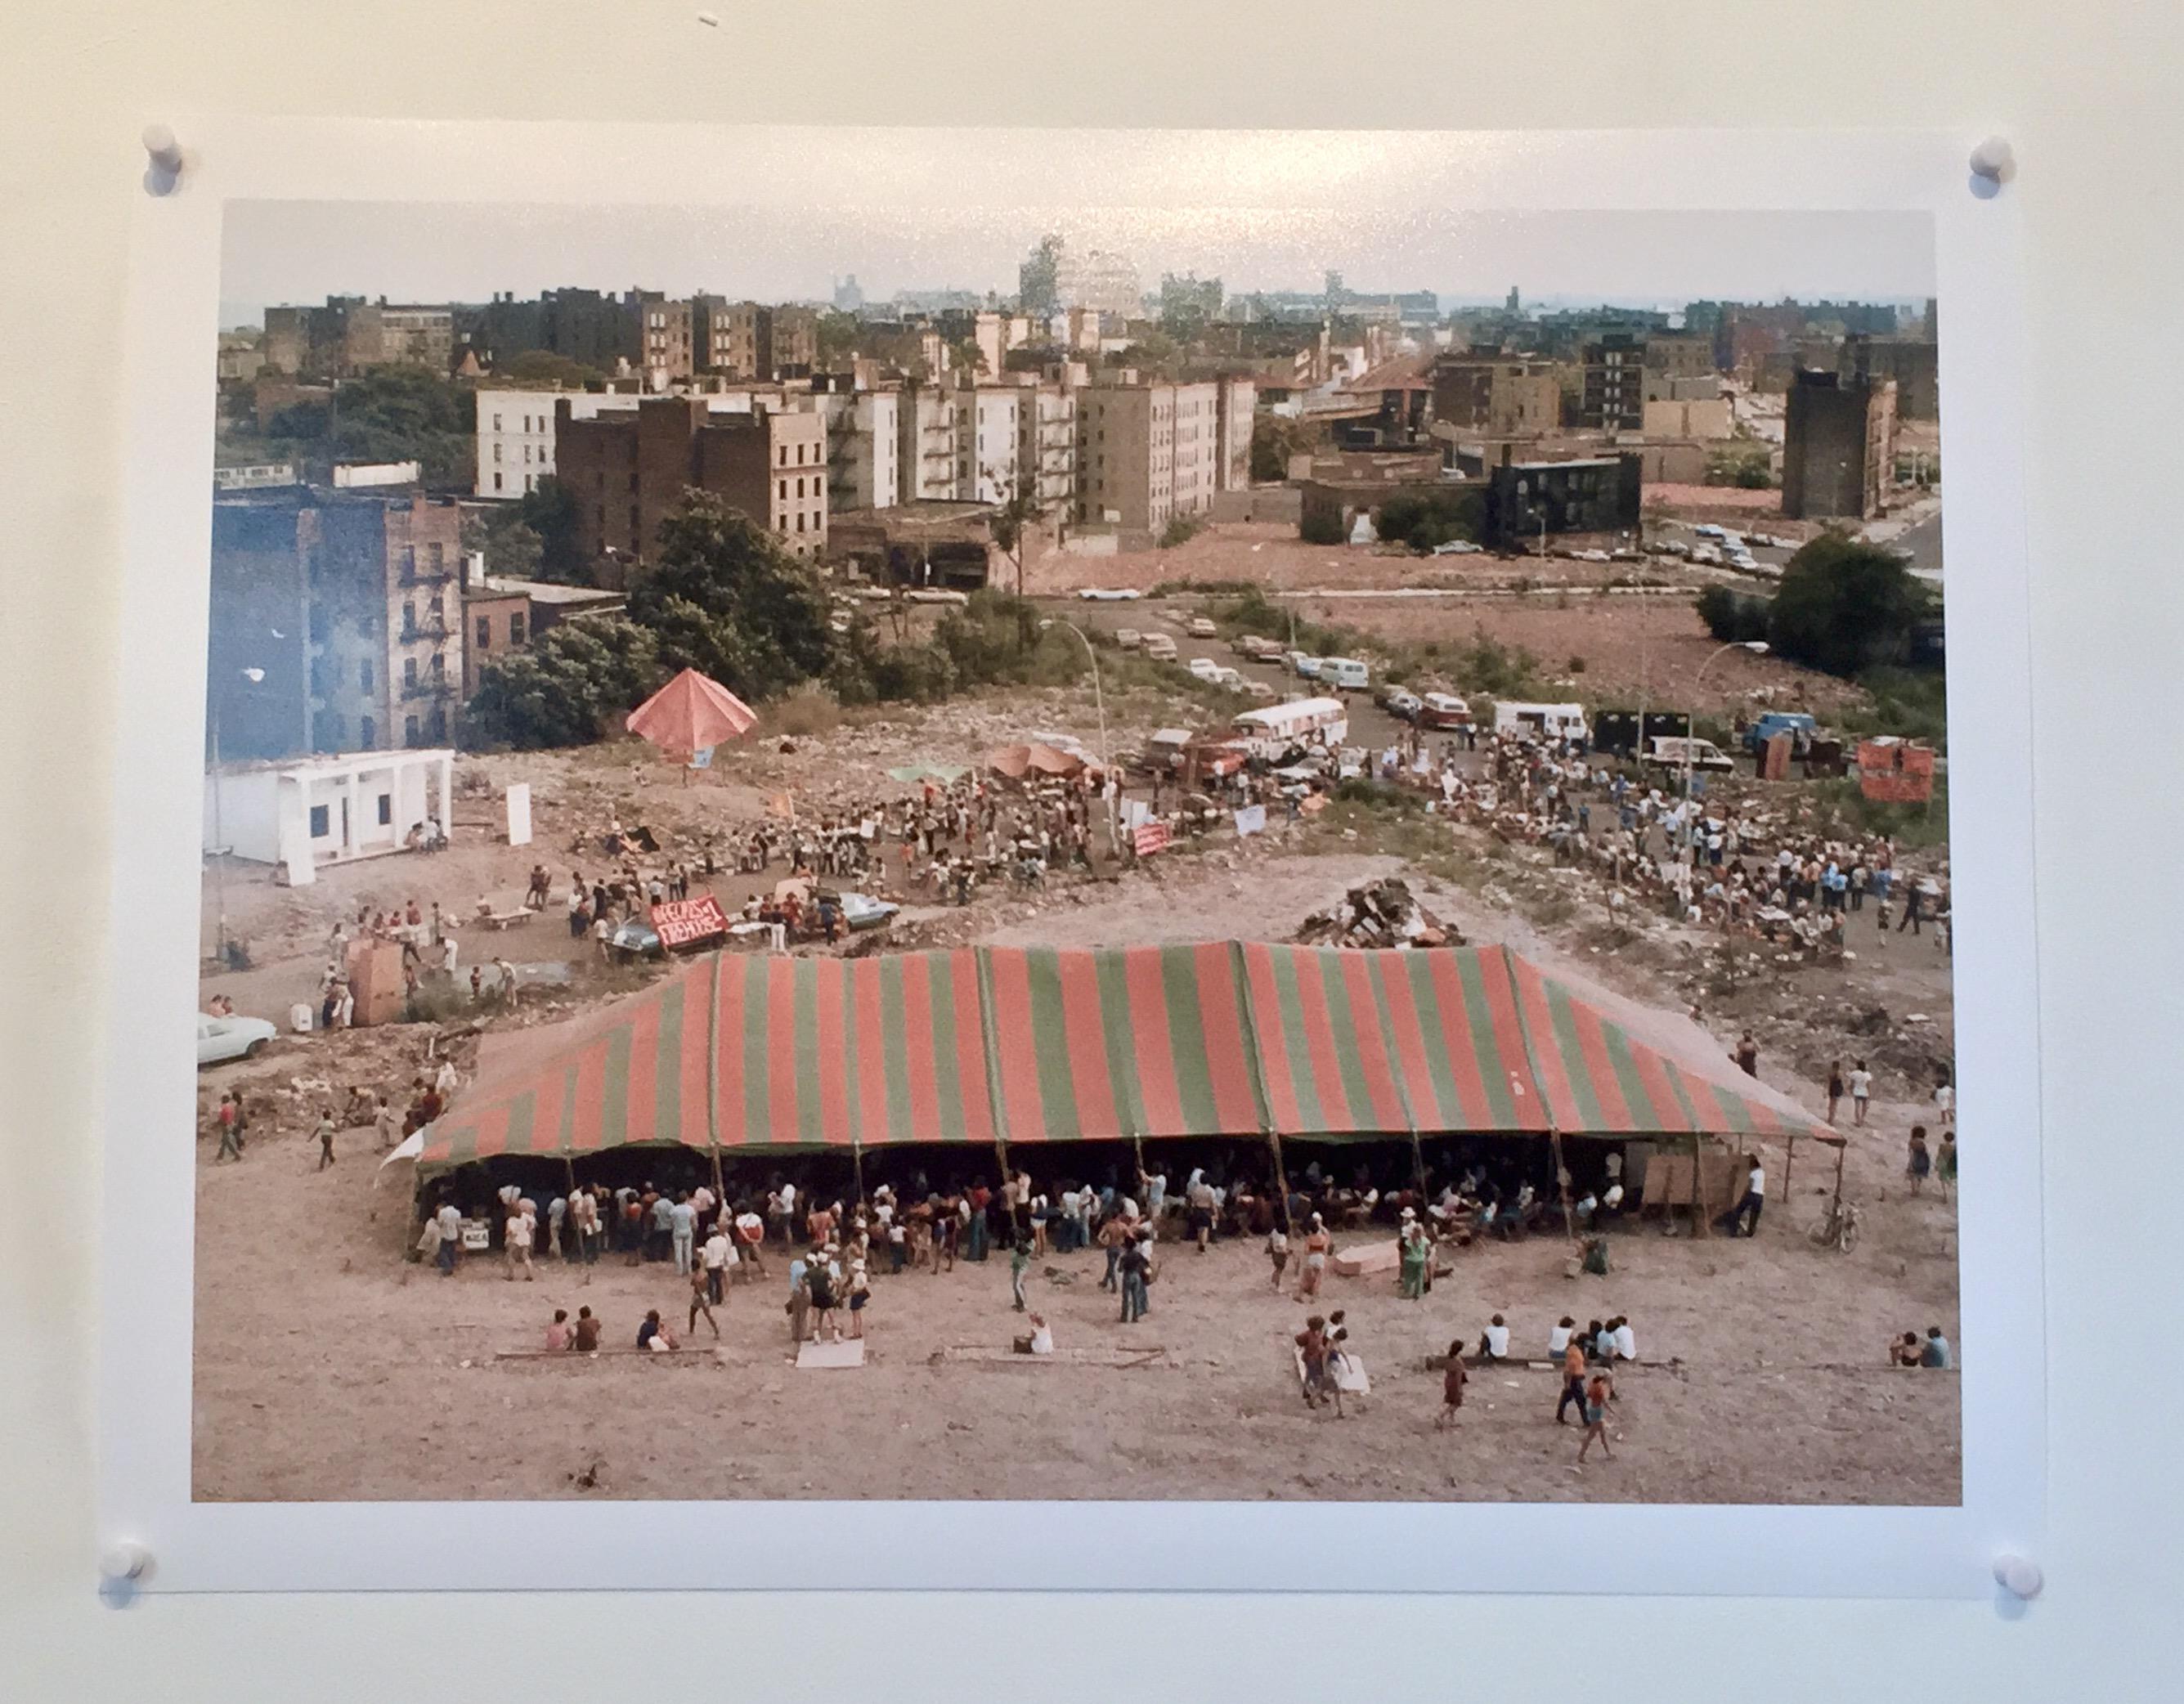 Tent - Lisa Kahane